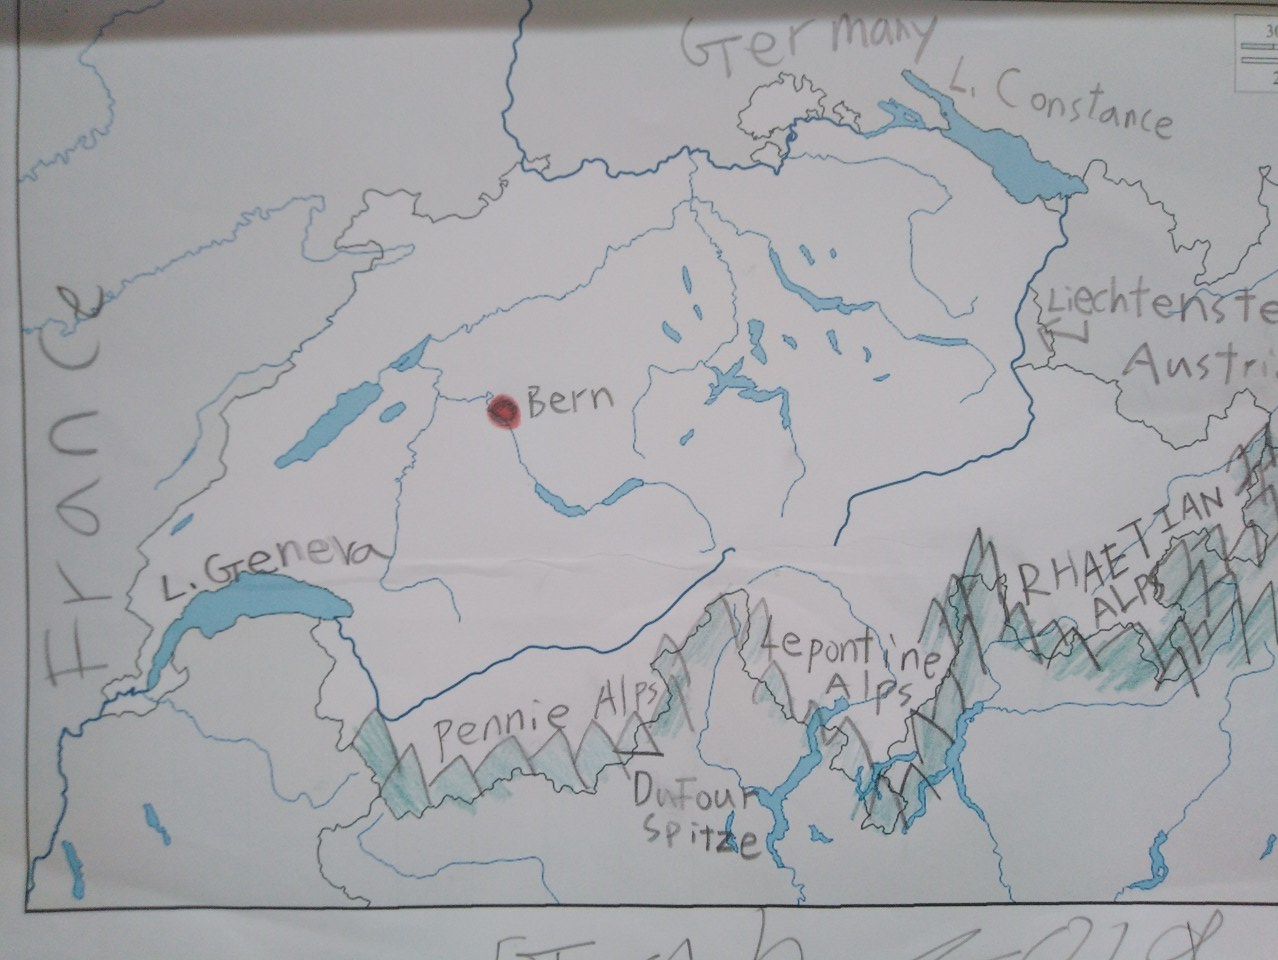 history-geography_190318_0062.jpg